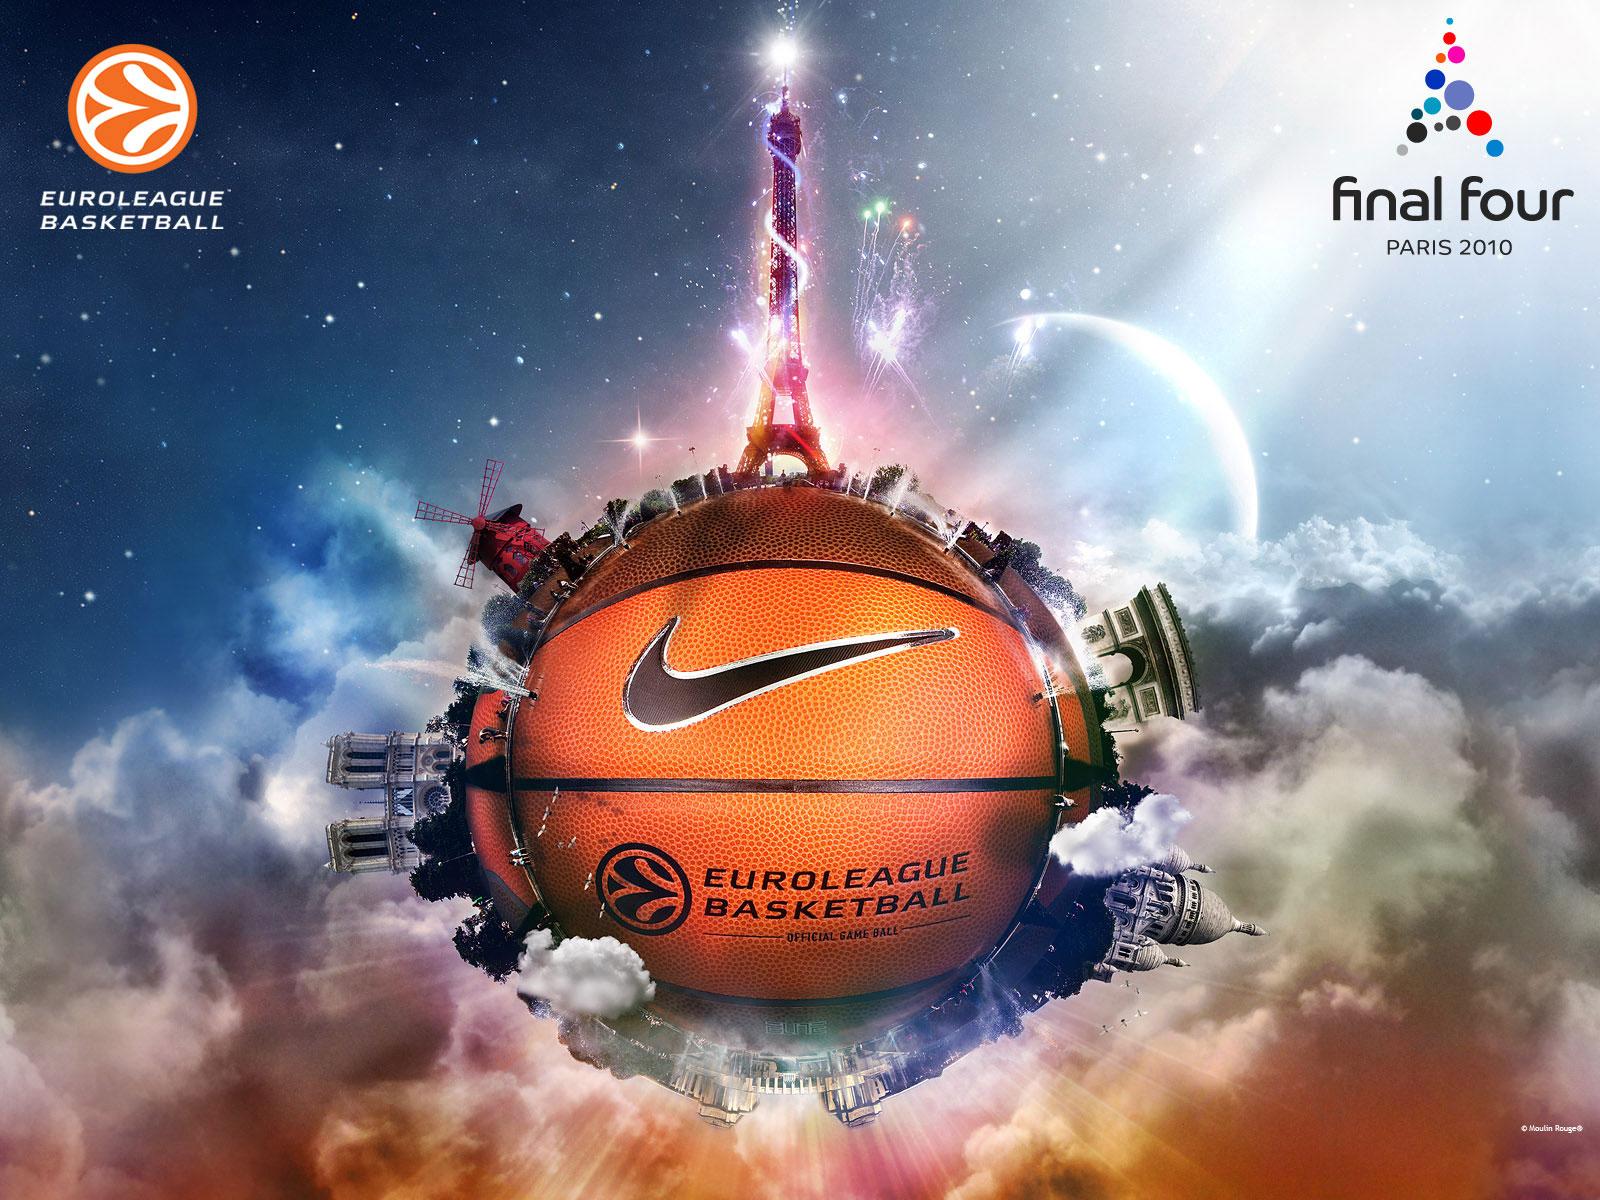 euroleage basketball